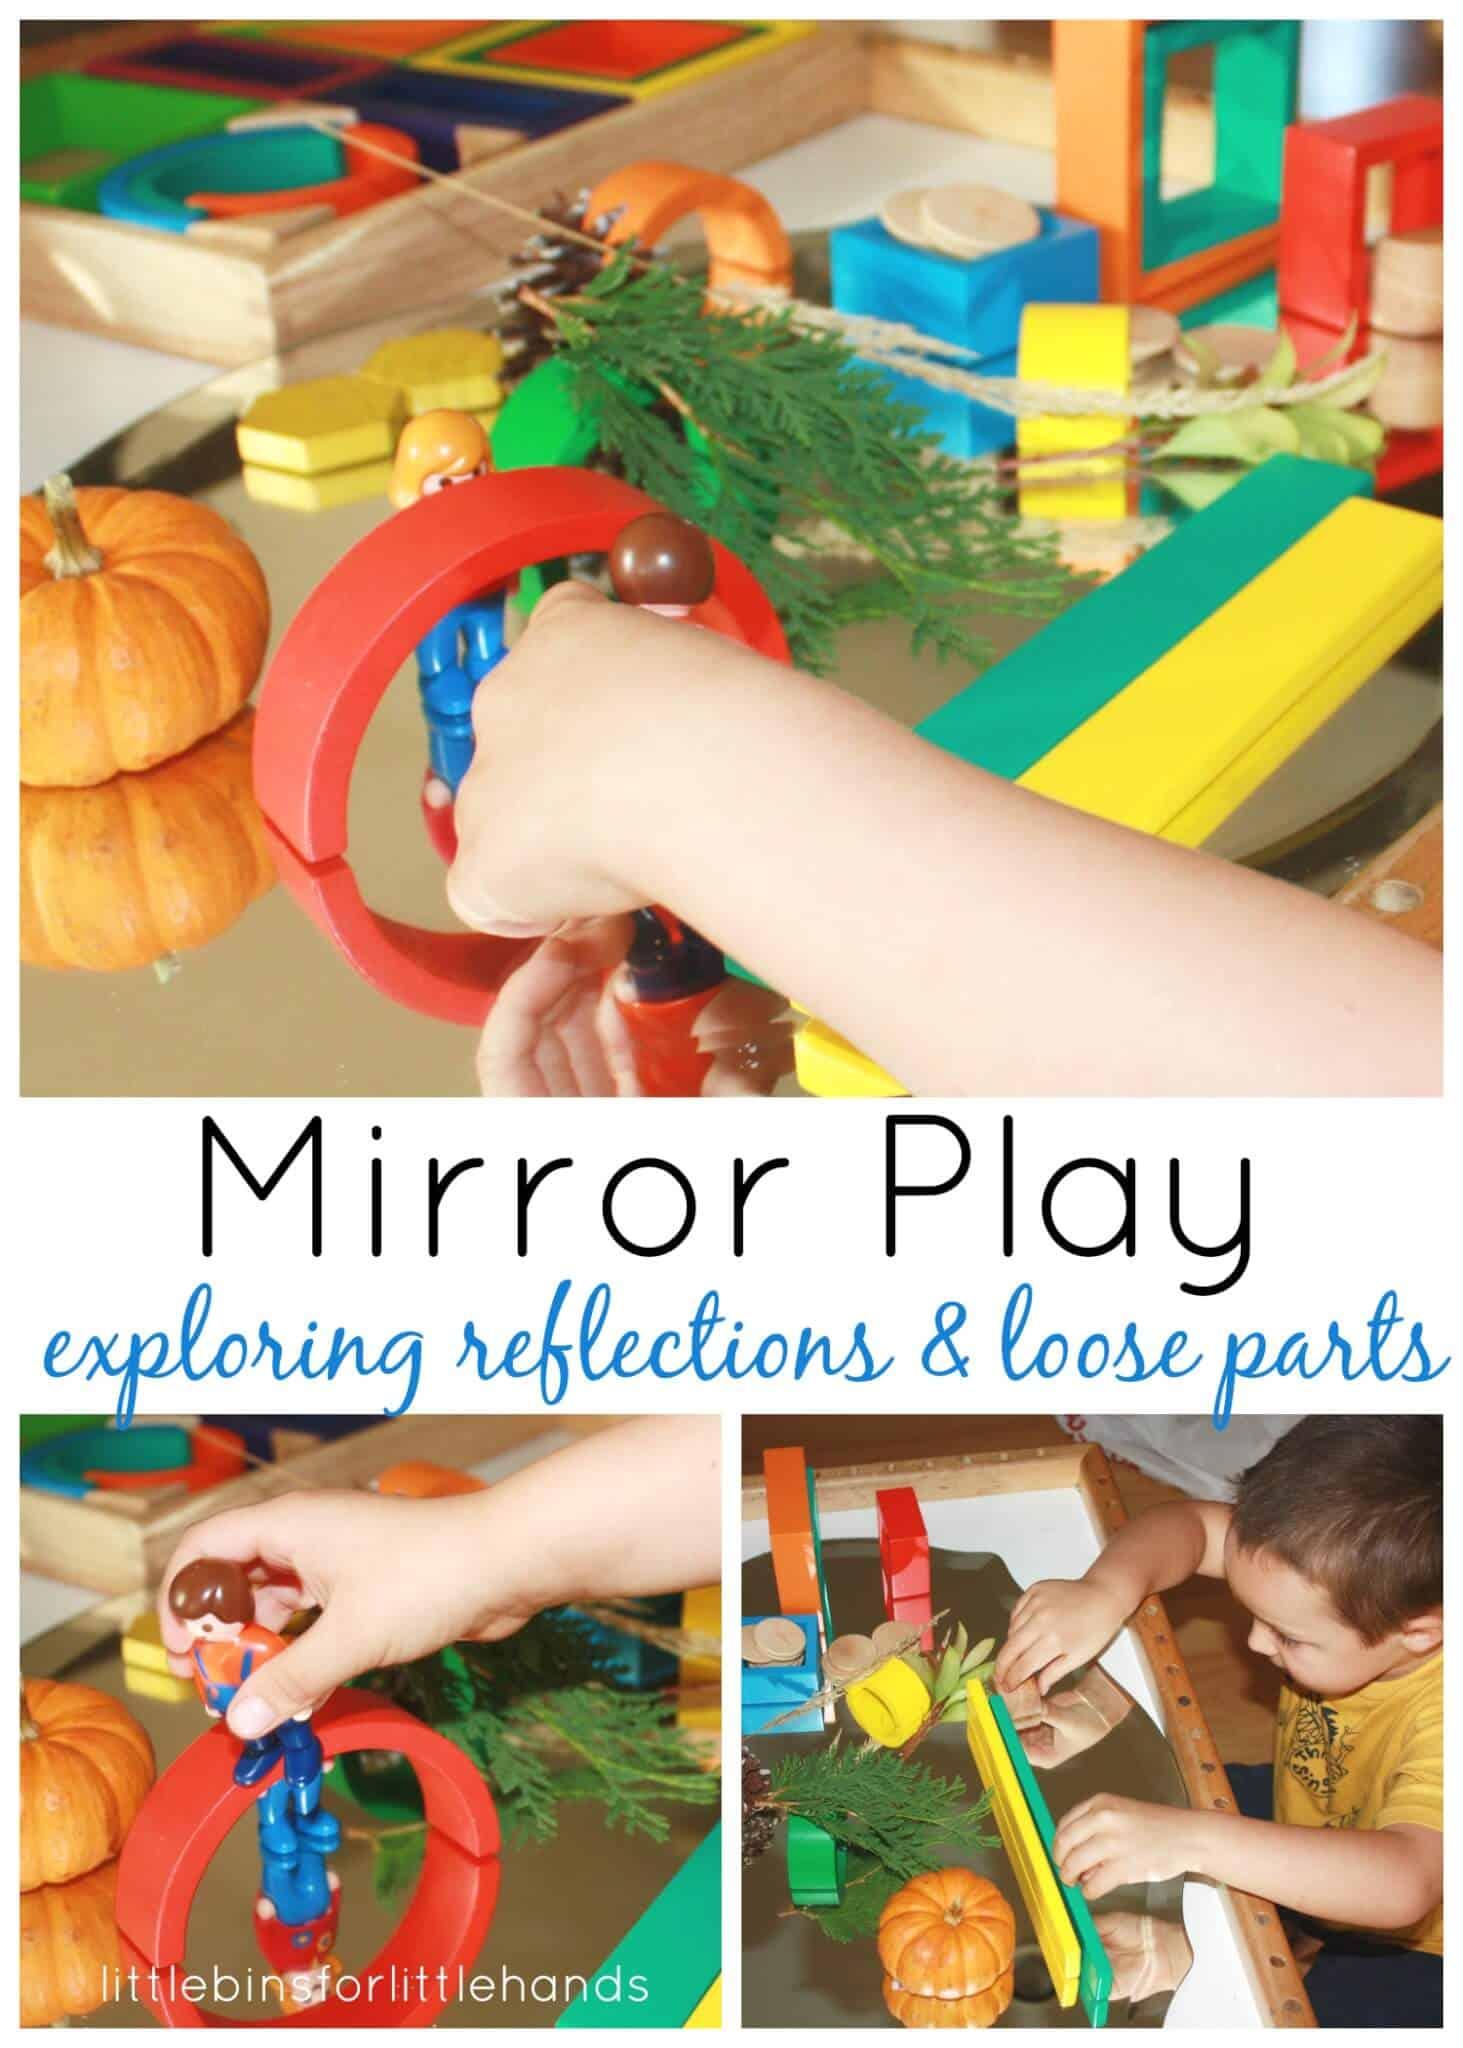 Preschool Discovery Table: Mirror Play